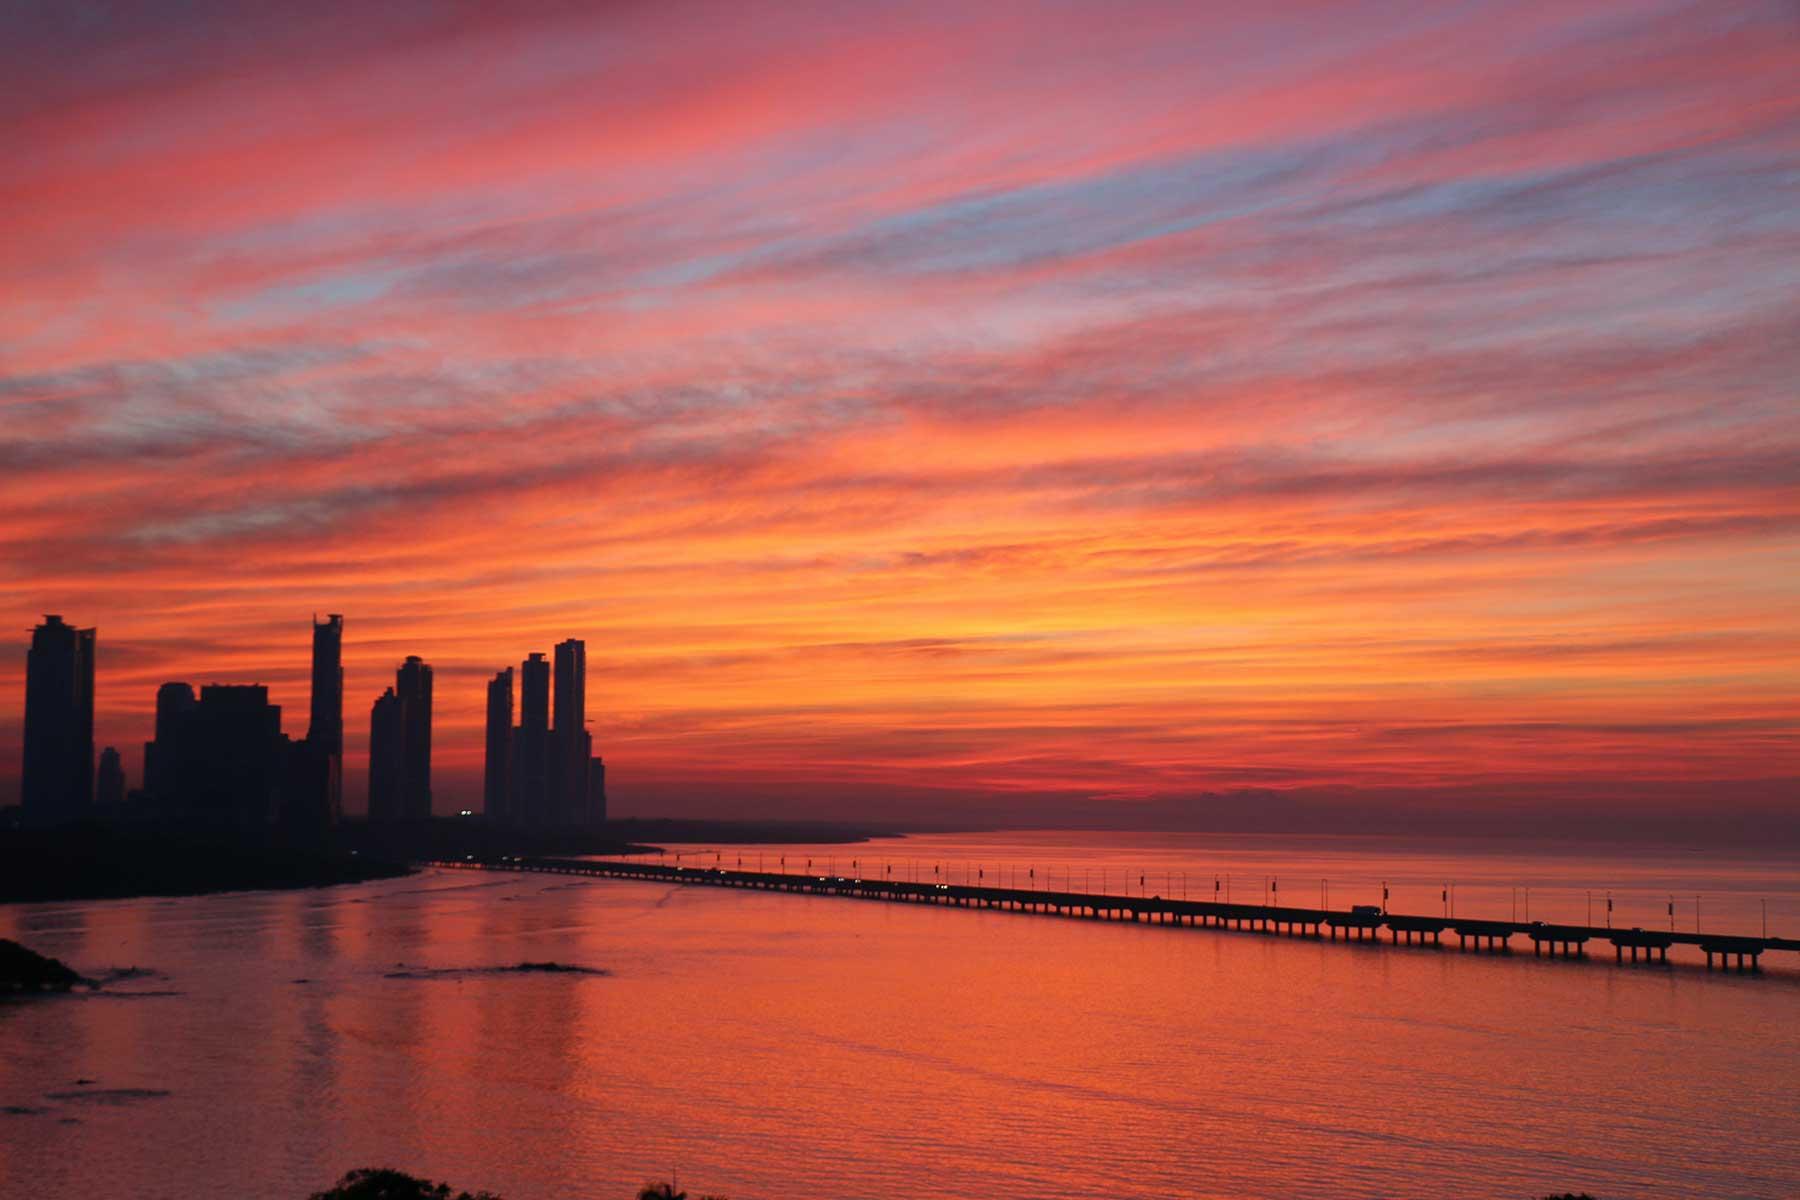 Resor-till-Panama-med-Nygren-&-LInd-Resebyrå---sunset-Panama-City